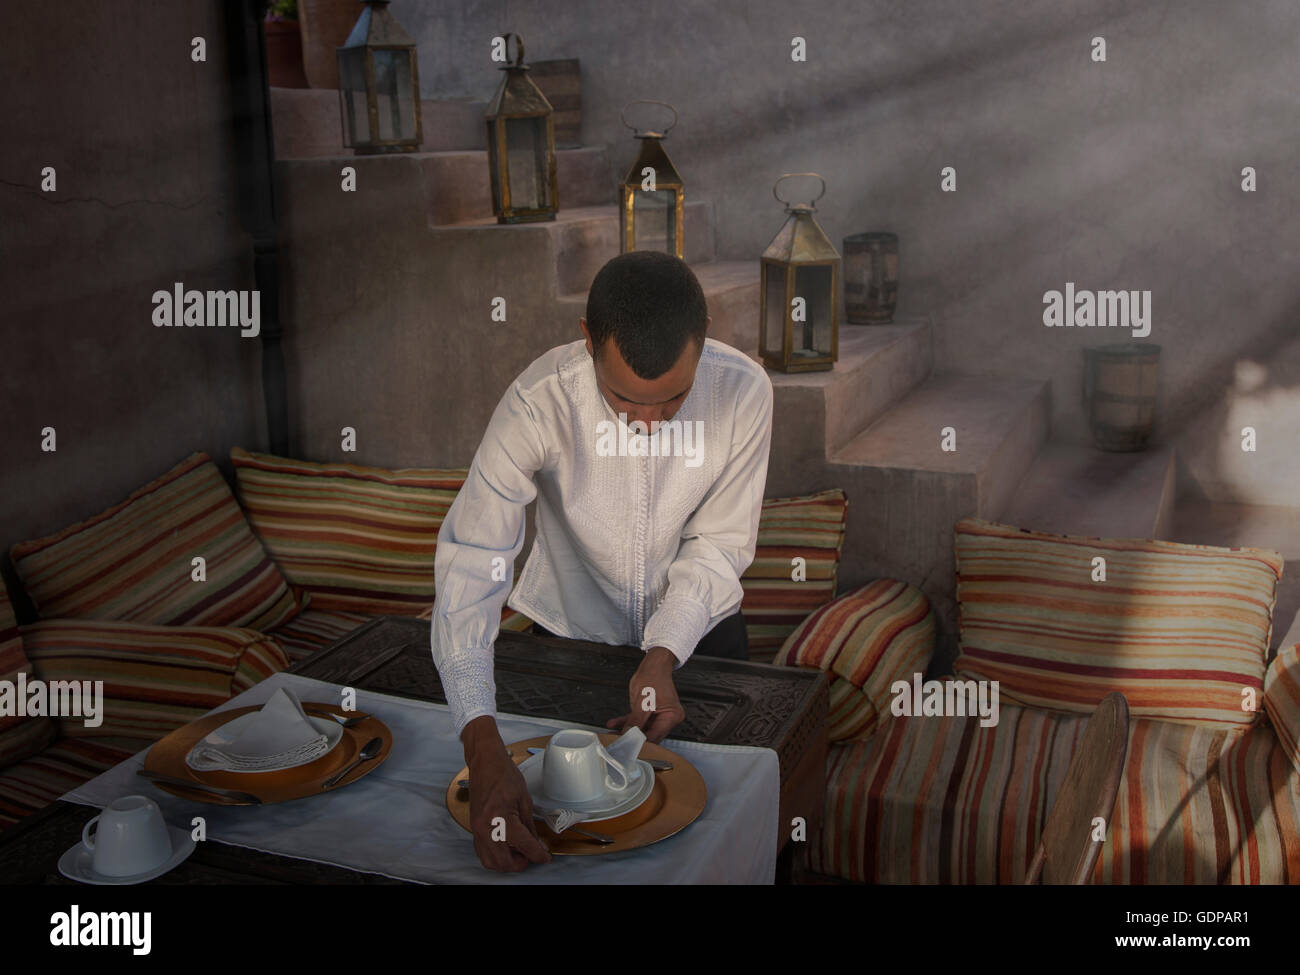 Waiter preparing place settings, Marrakesh, Morocco - Stock Image